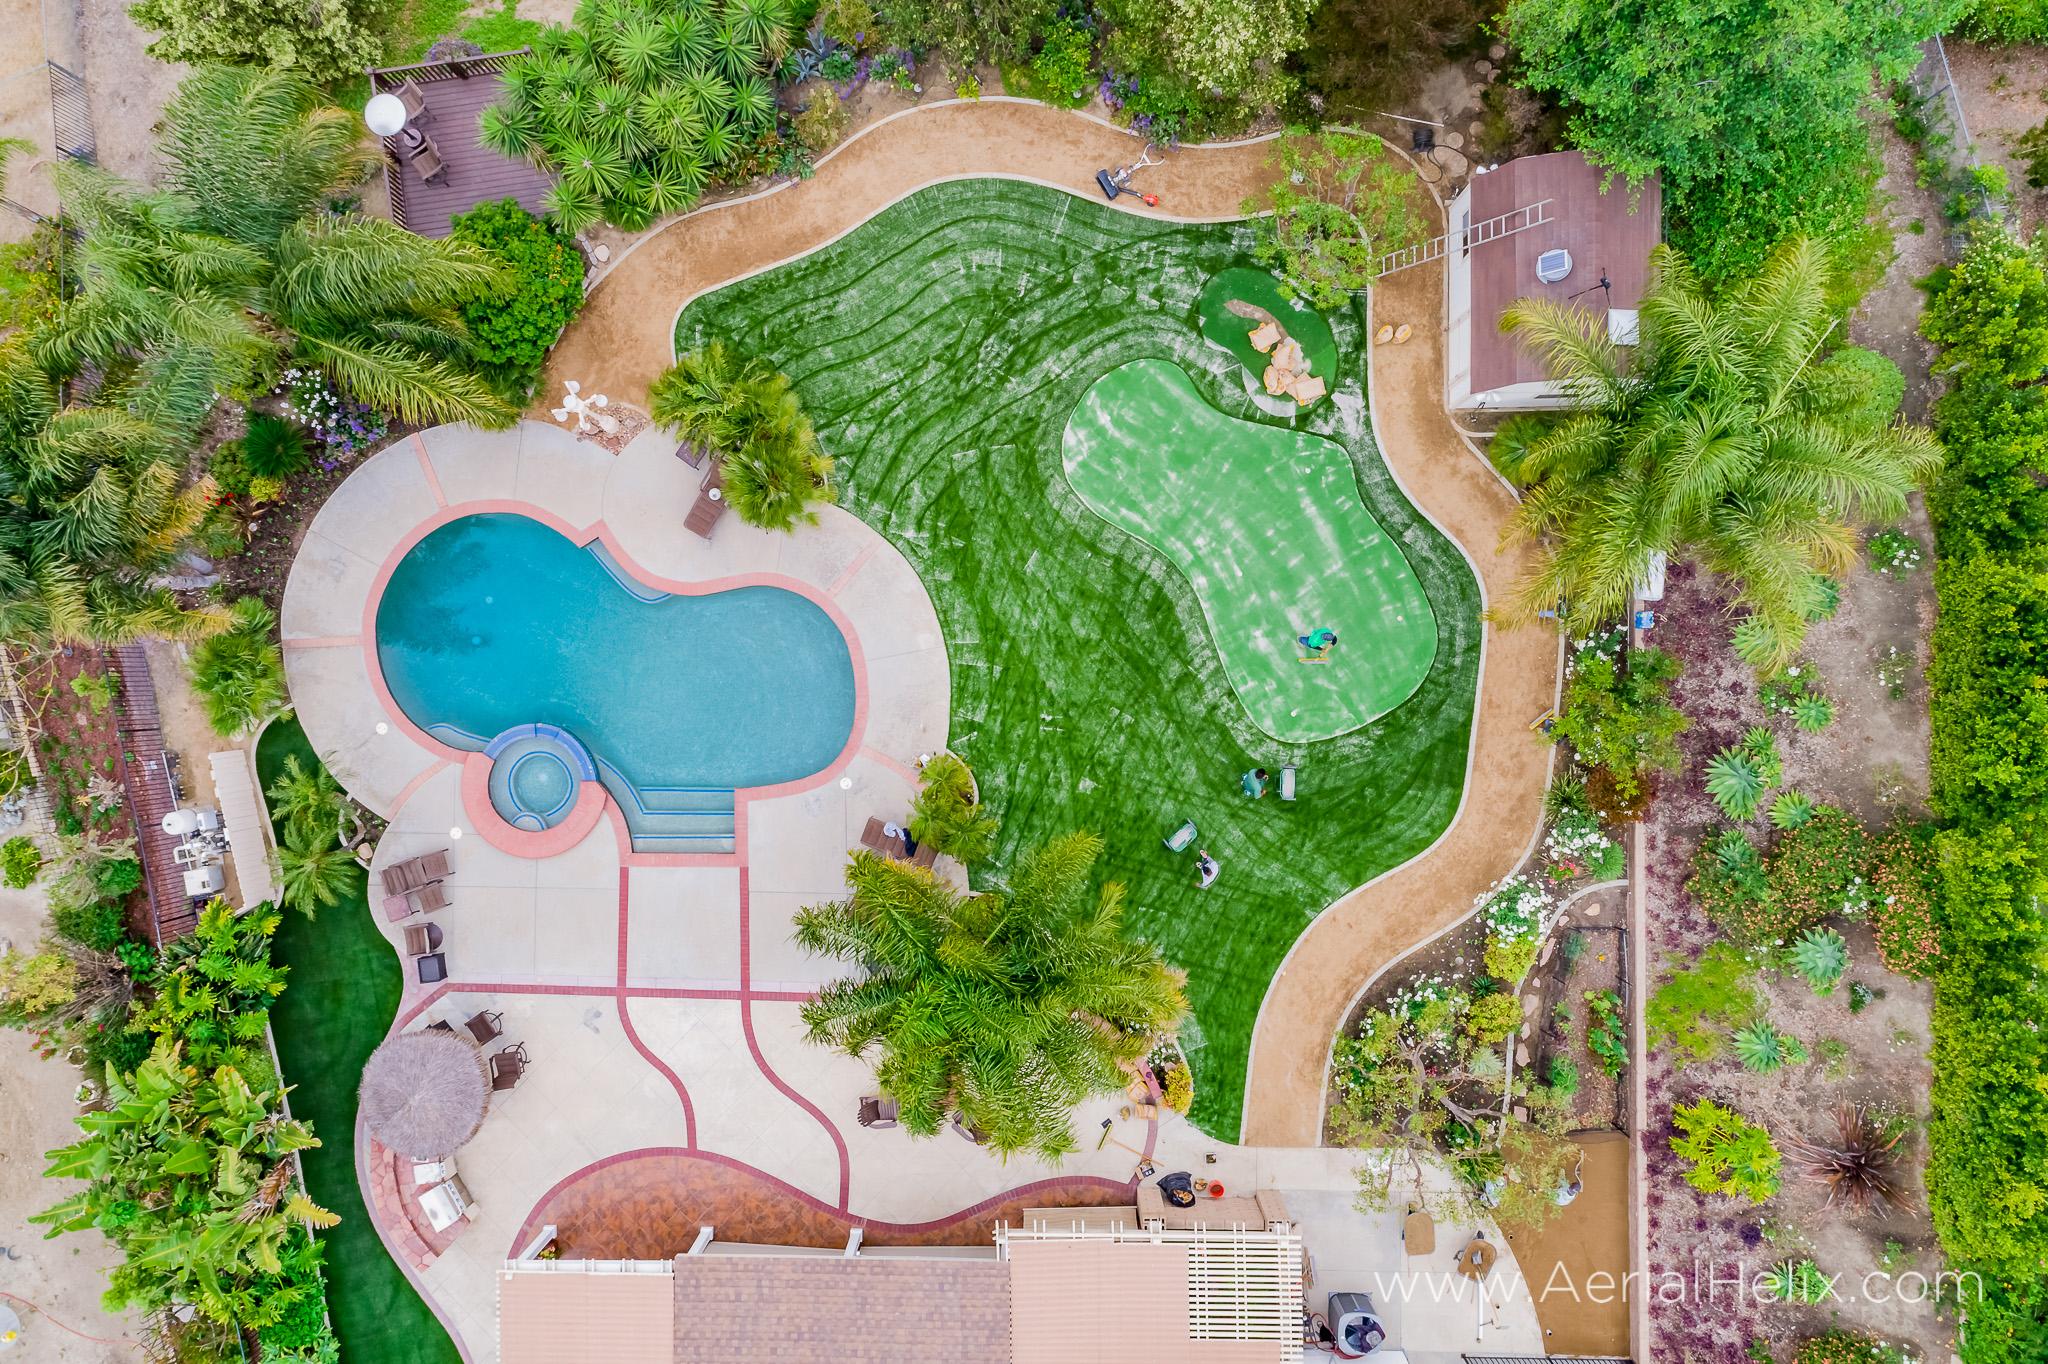 Joe Grass Install Photos aerial-1.jpg